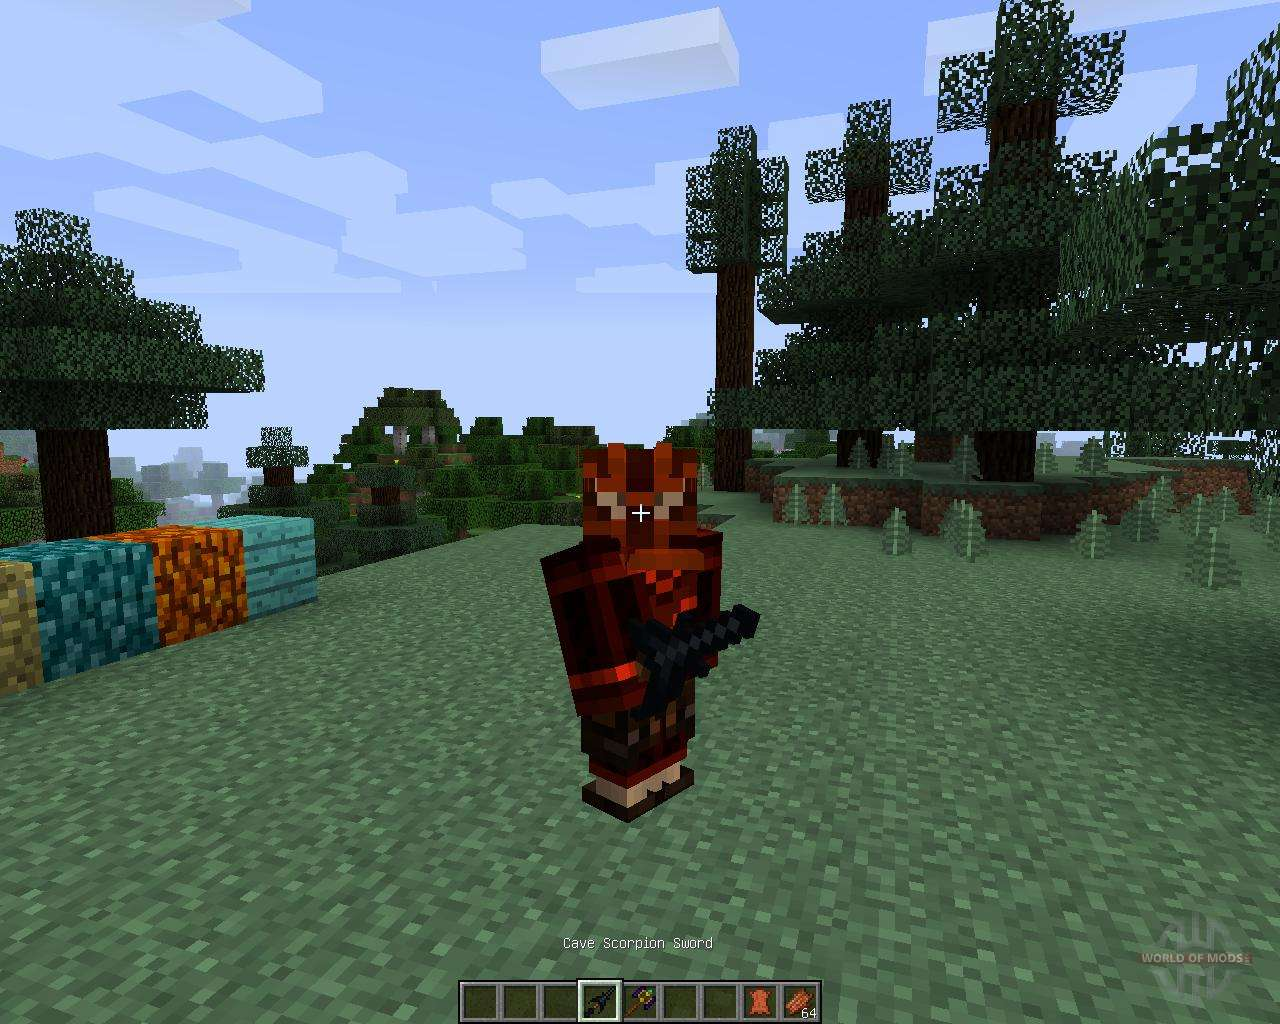 Mo'Creatures мод для Minecraft 1.7.10/1.7.2/1.6.4/1.6.2 ...